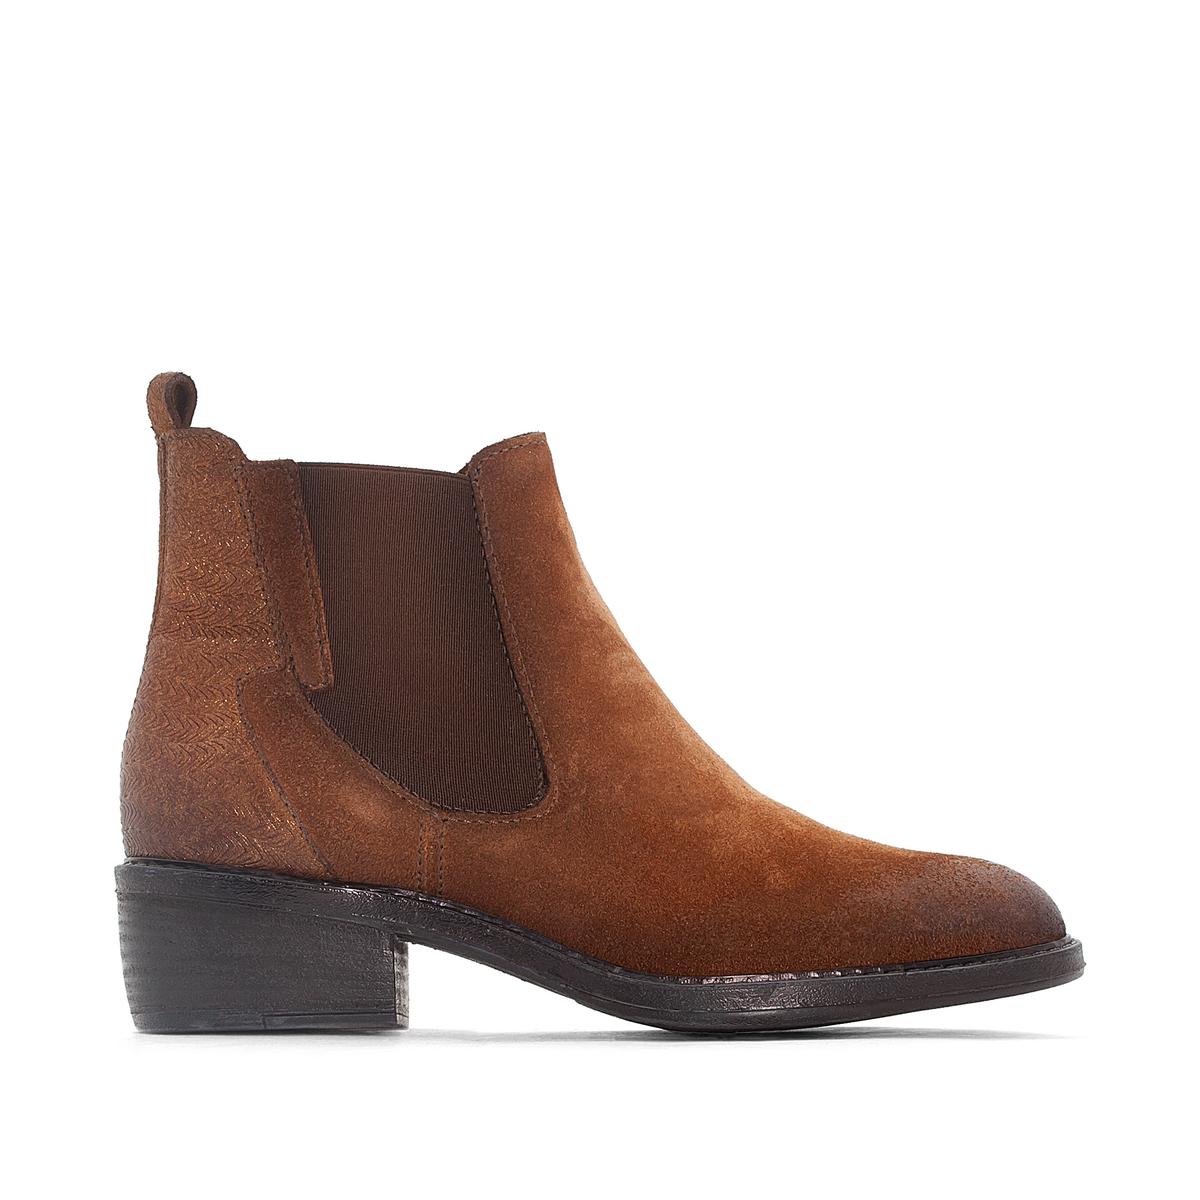 Ботильоны кожаные Gaucho цены онлайн